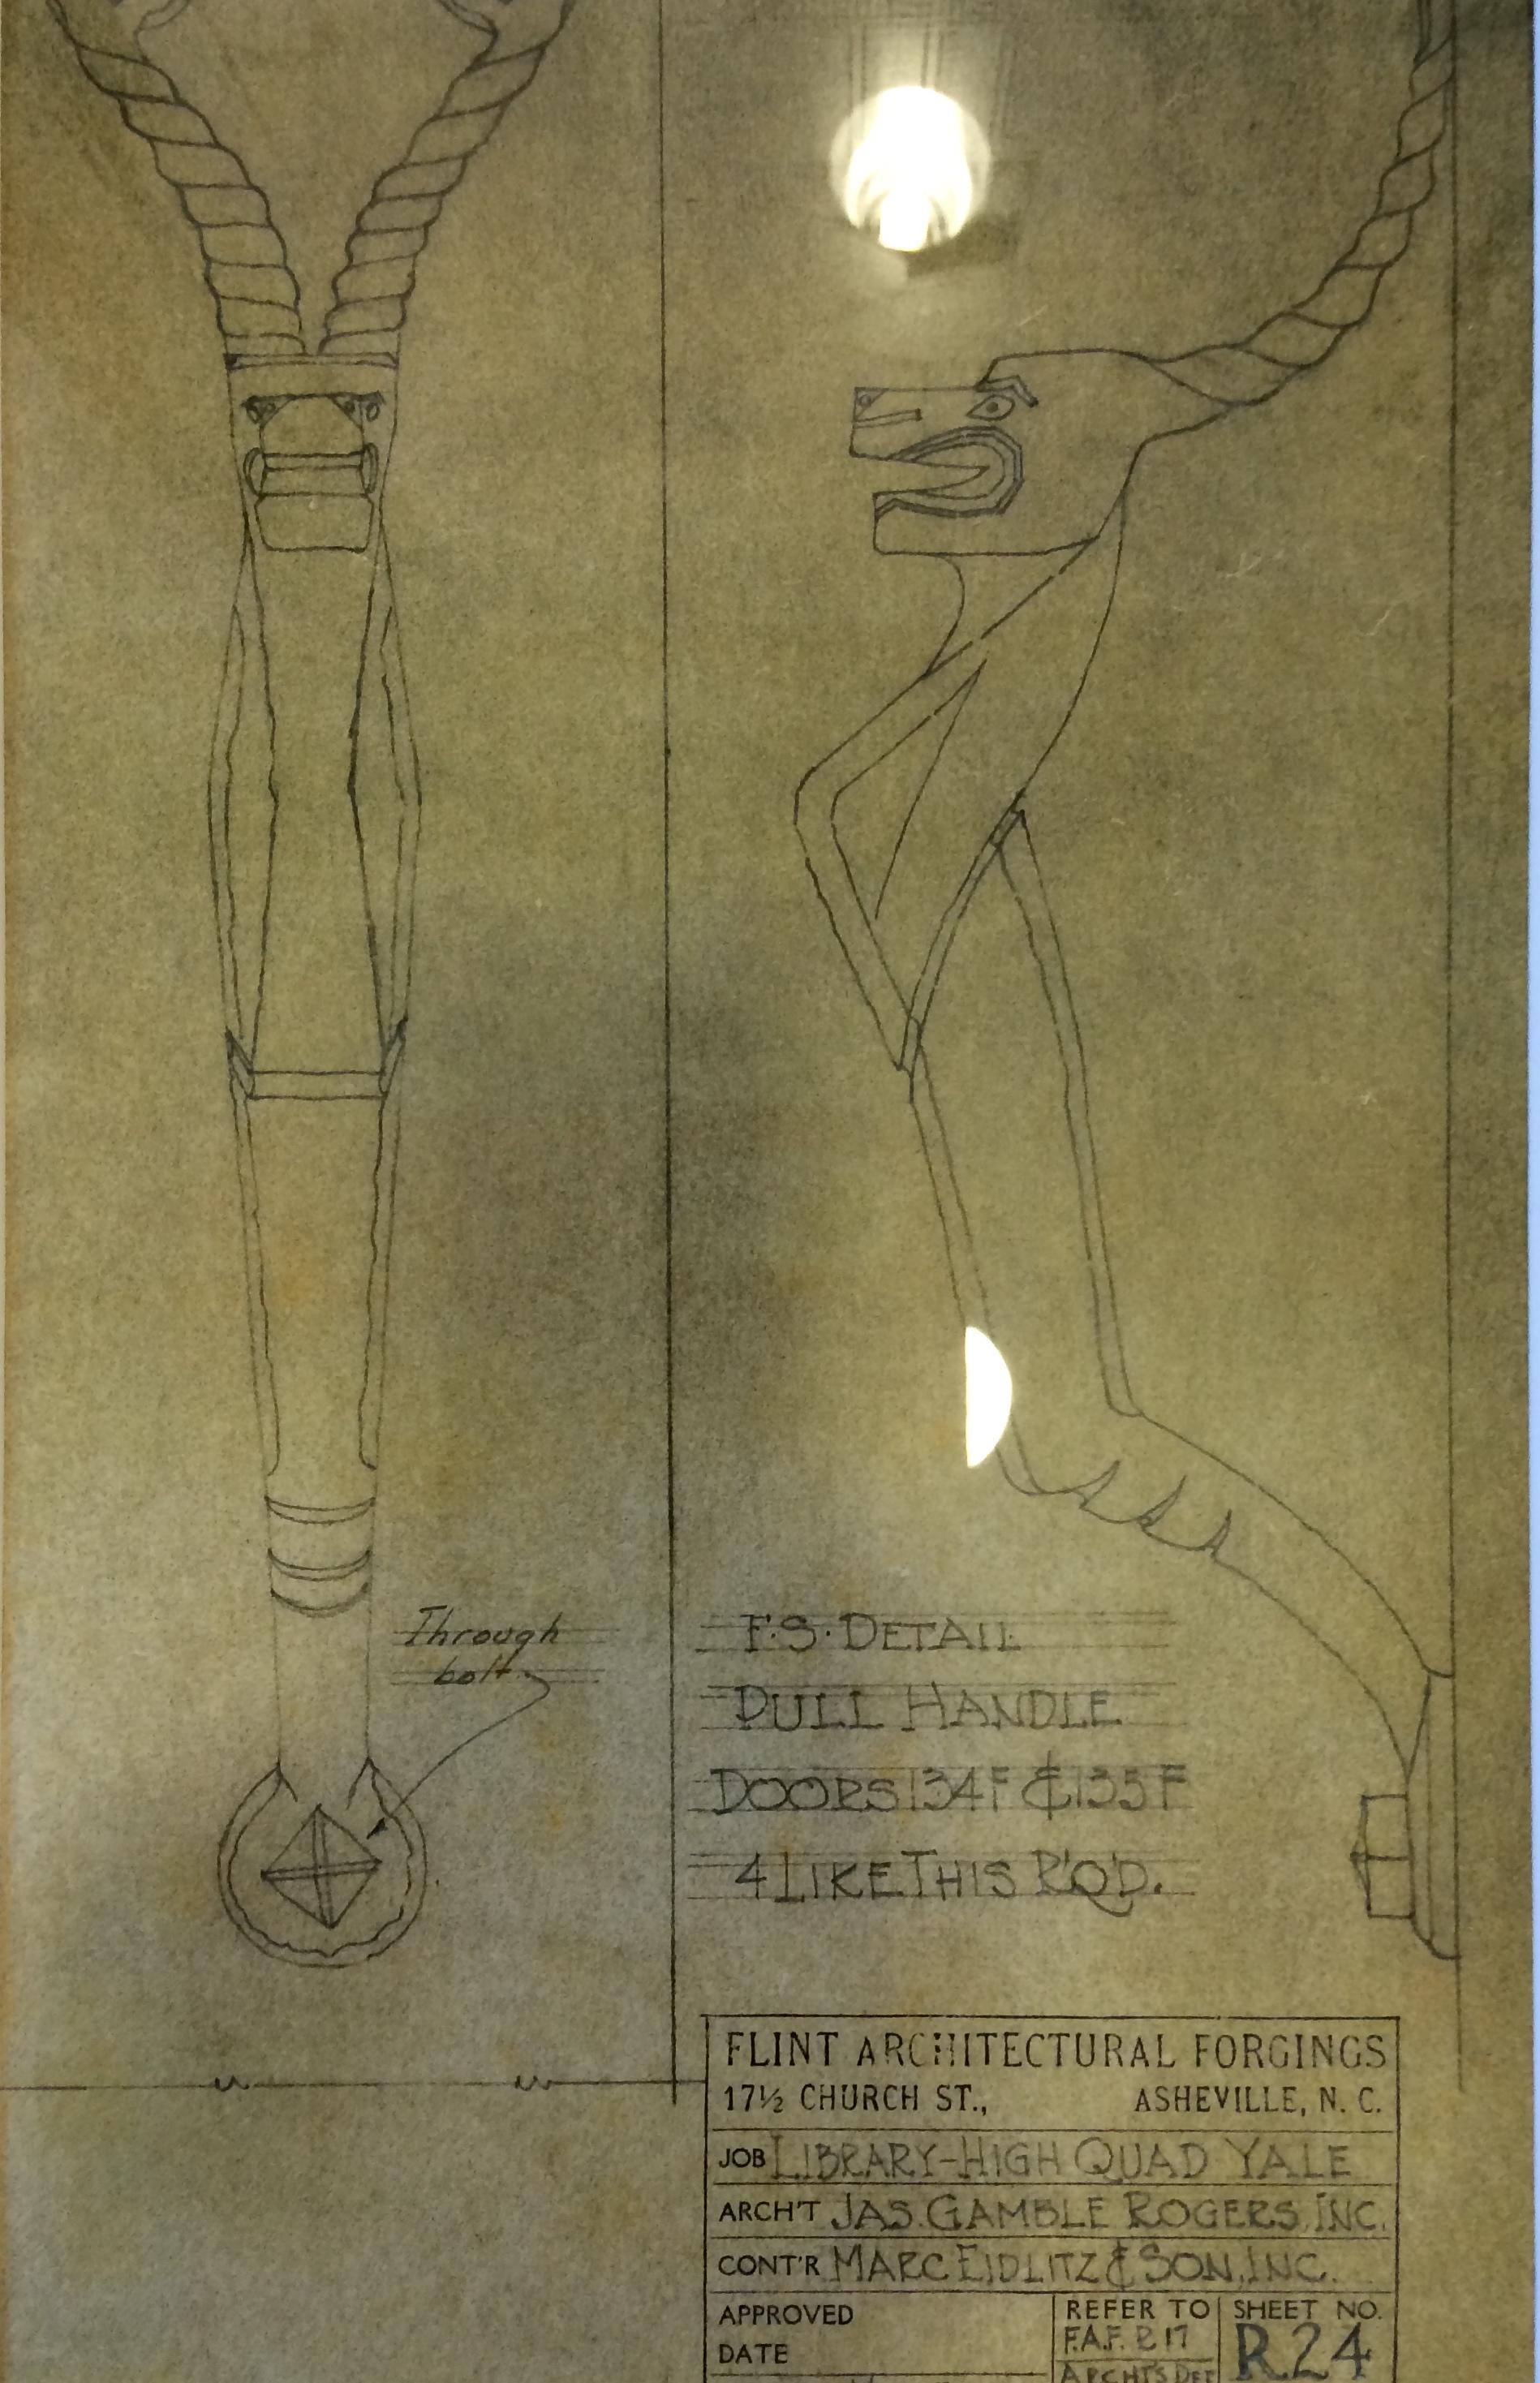 Plans for an elegant door knob